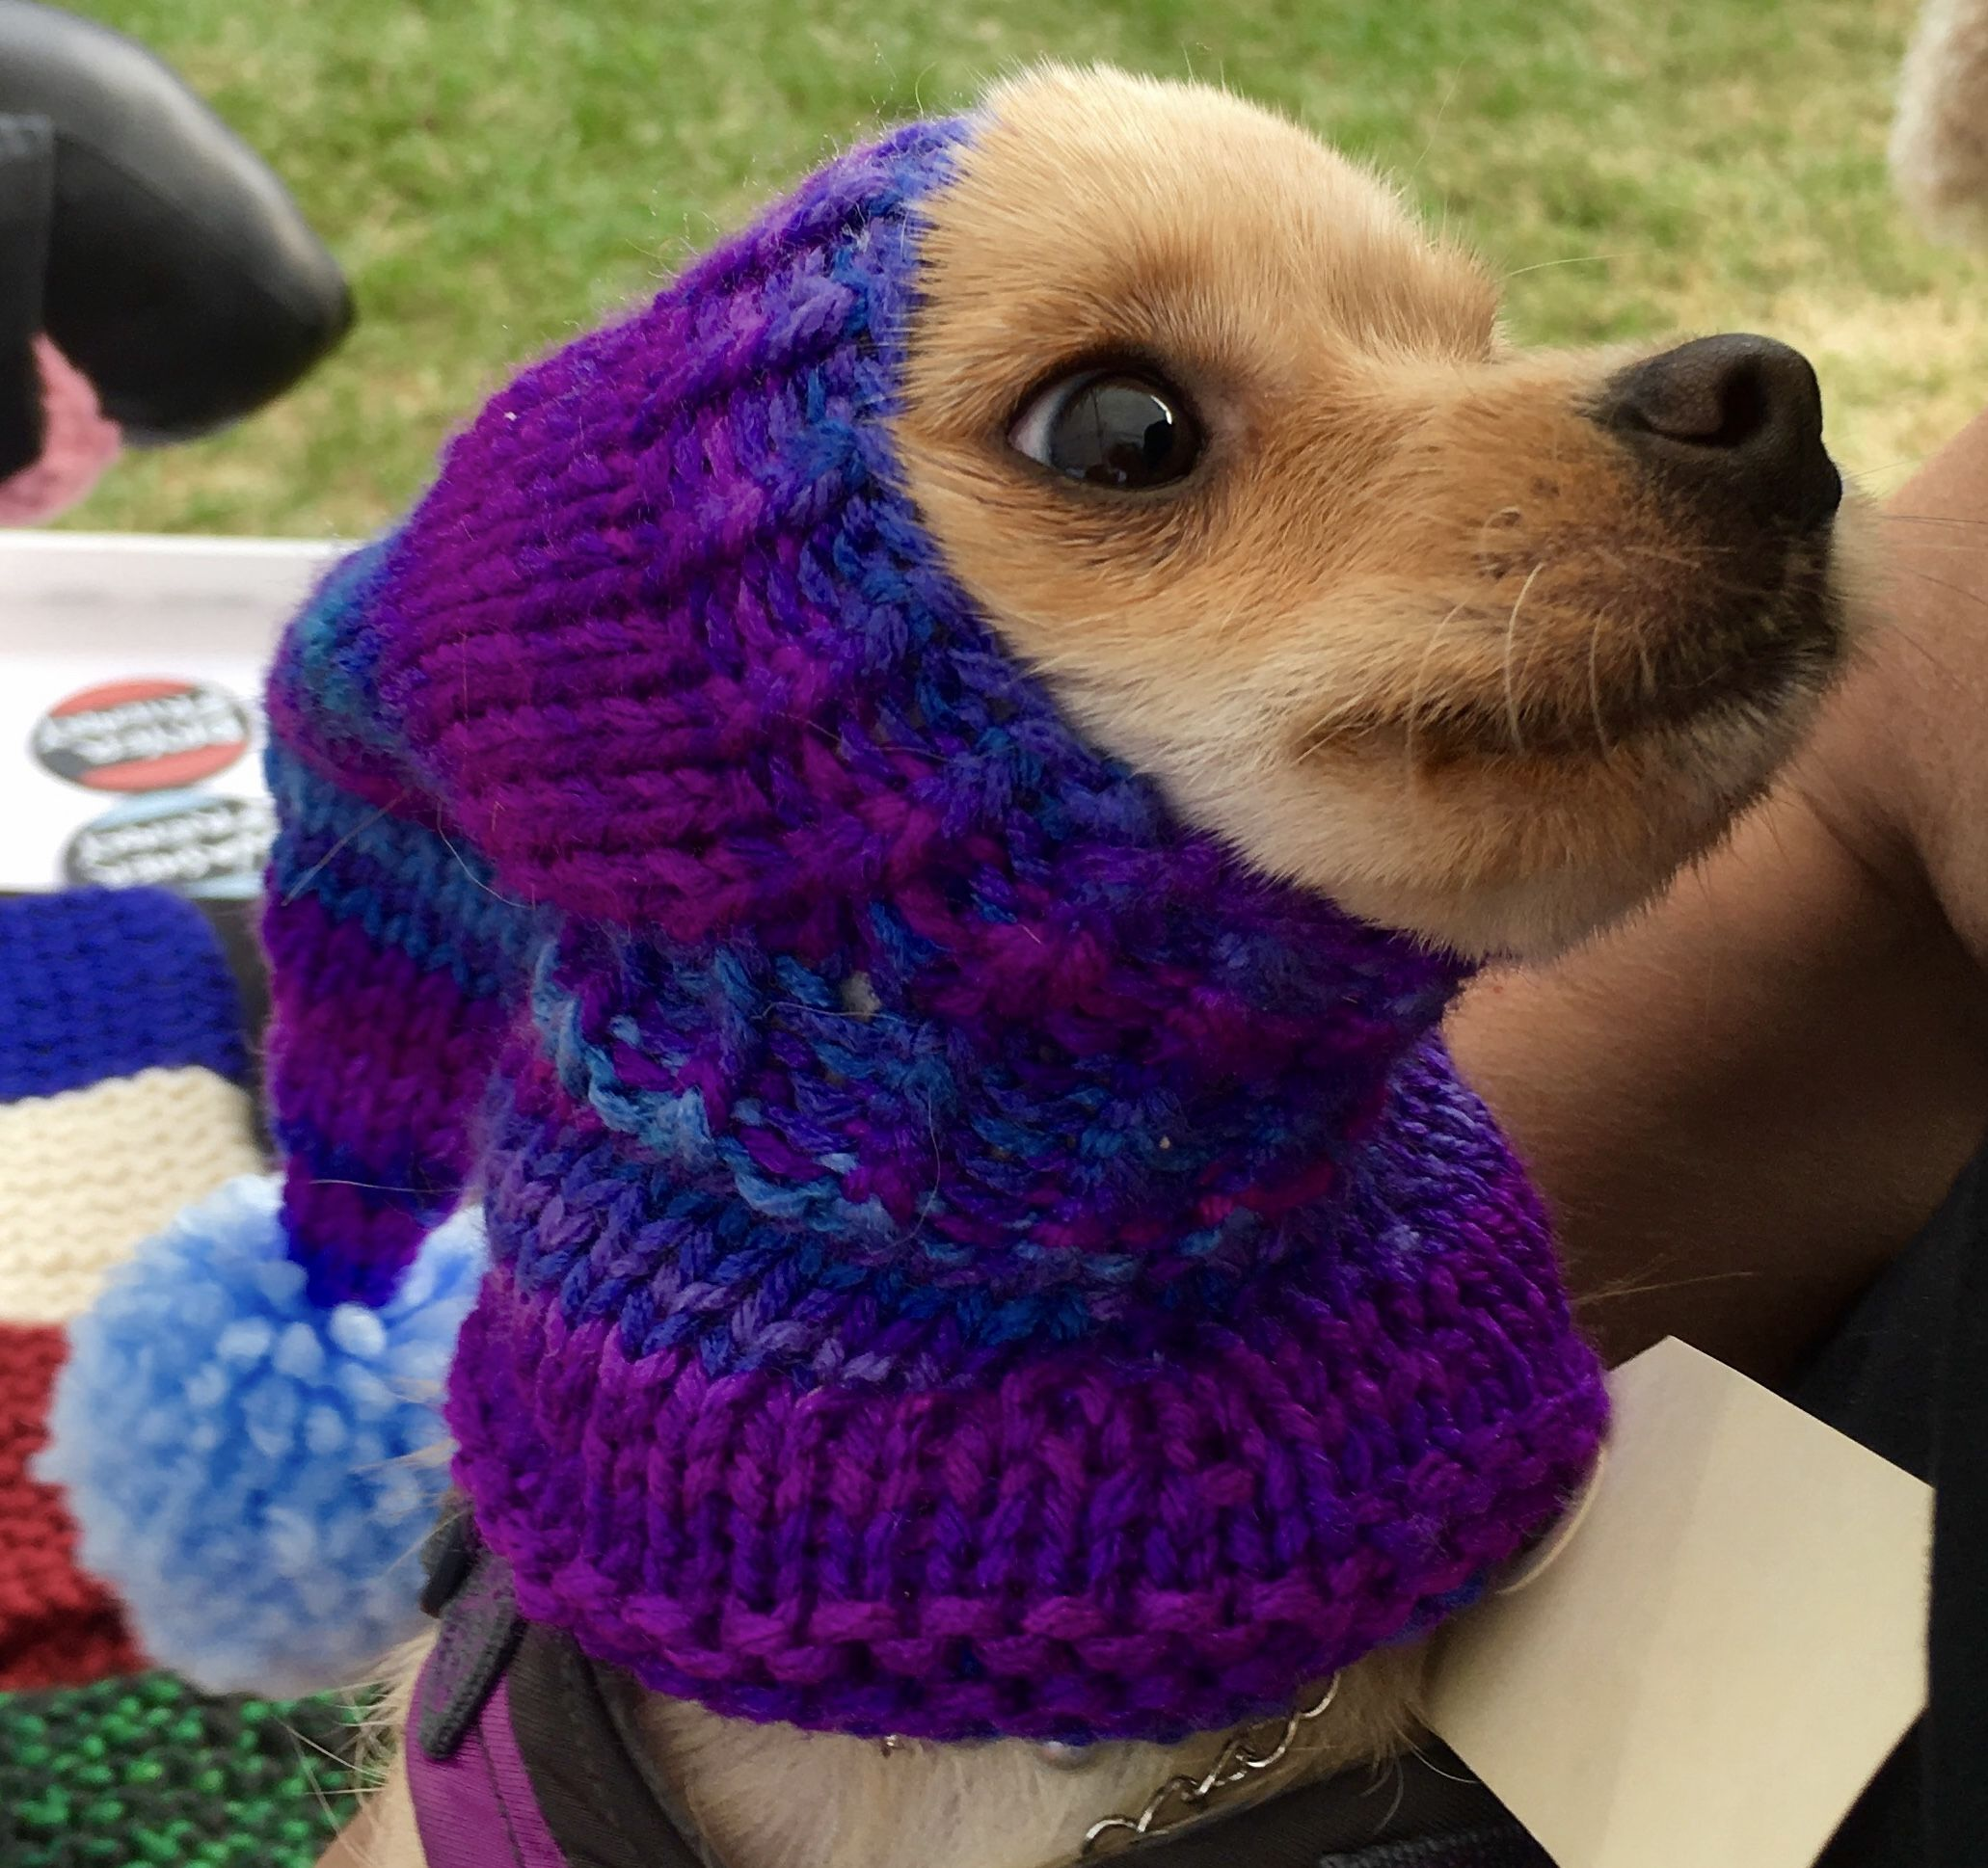 Pet Pilgrim Hat Xs S M By Eternallightshop On Etsy 12 00 Pet Crochet Pilgrim Thanksgiving Dog Cat Hat Be Dog Thanksgiving Dog Clothes Diy Pet Holiday